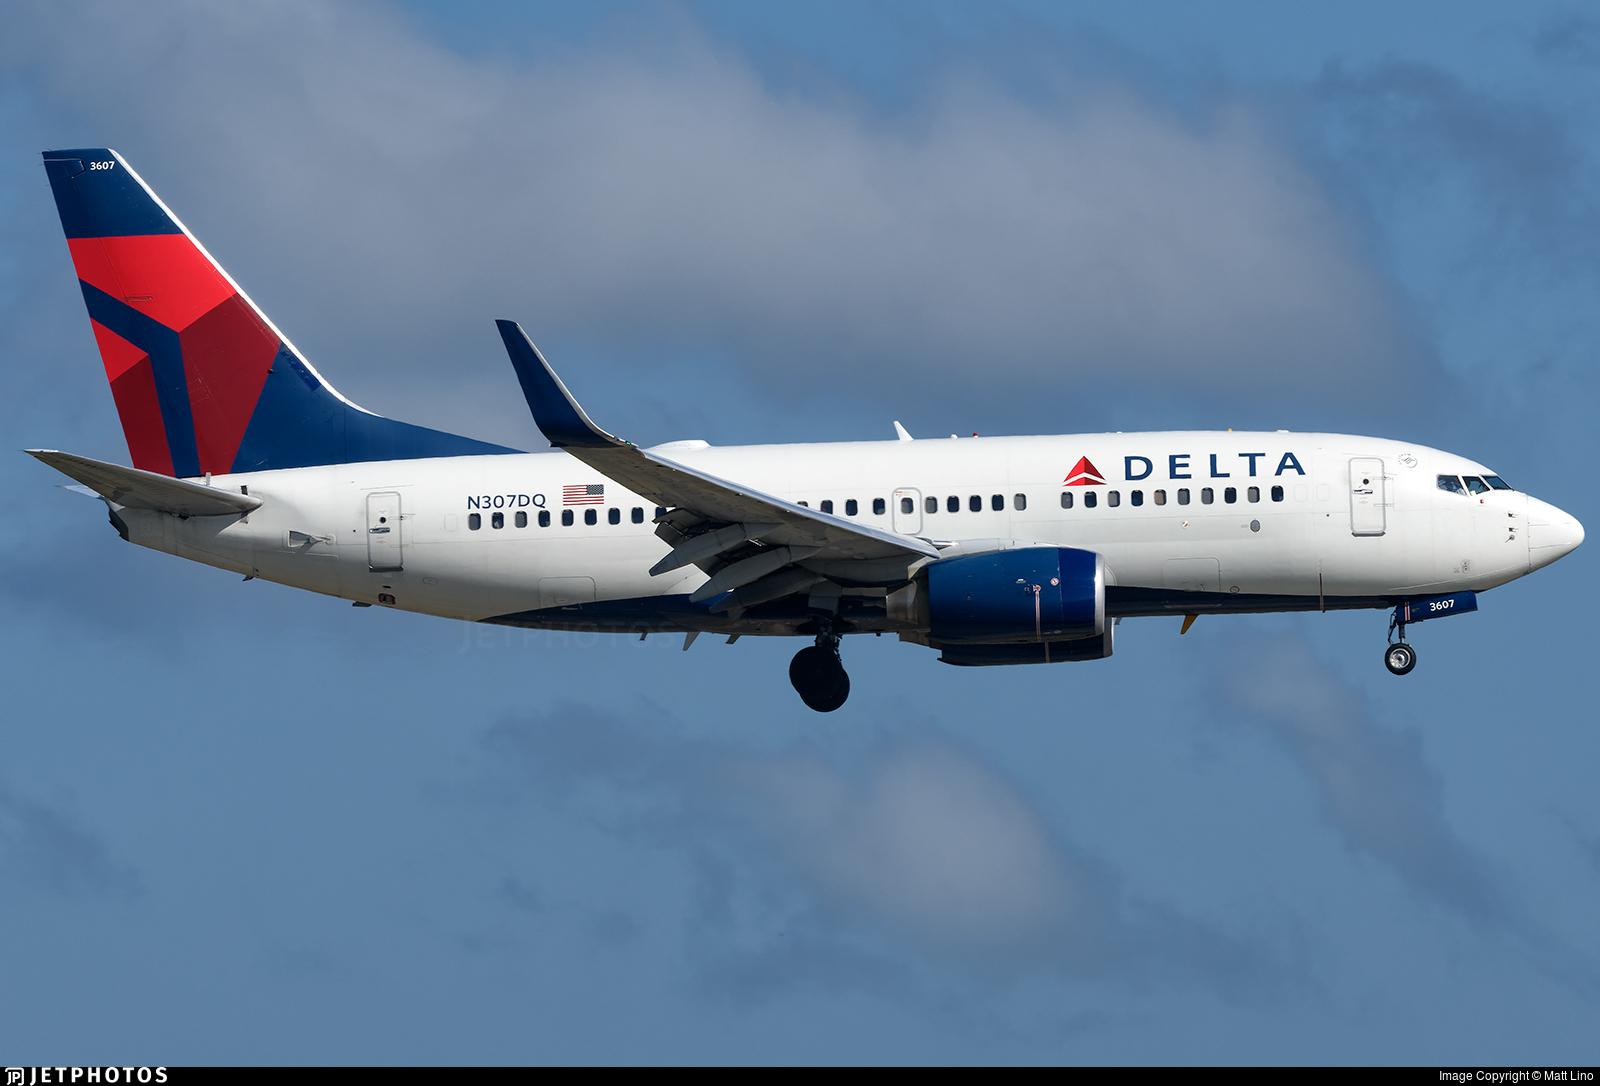 N307DQ - Boeing 737-732 - Delta Air Lines